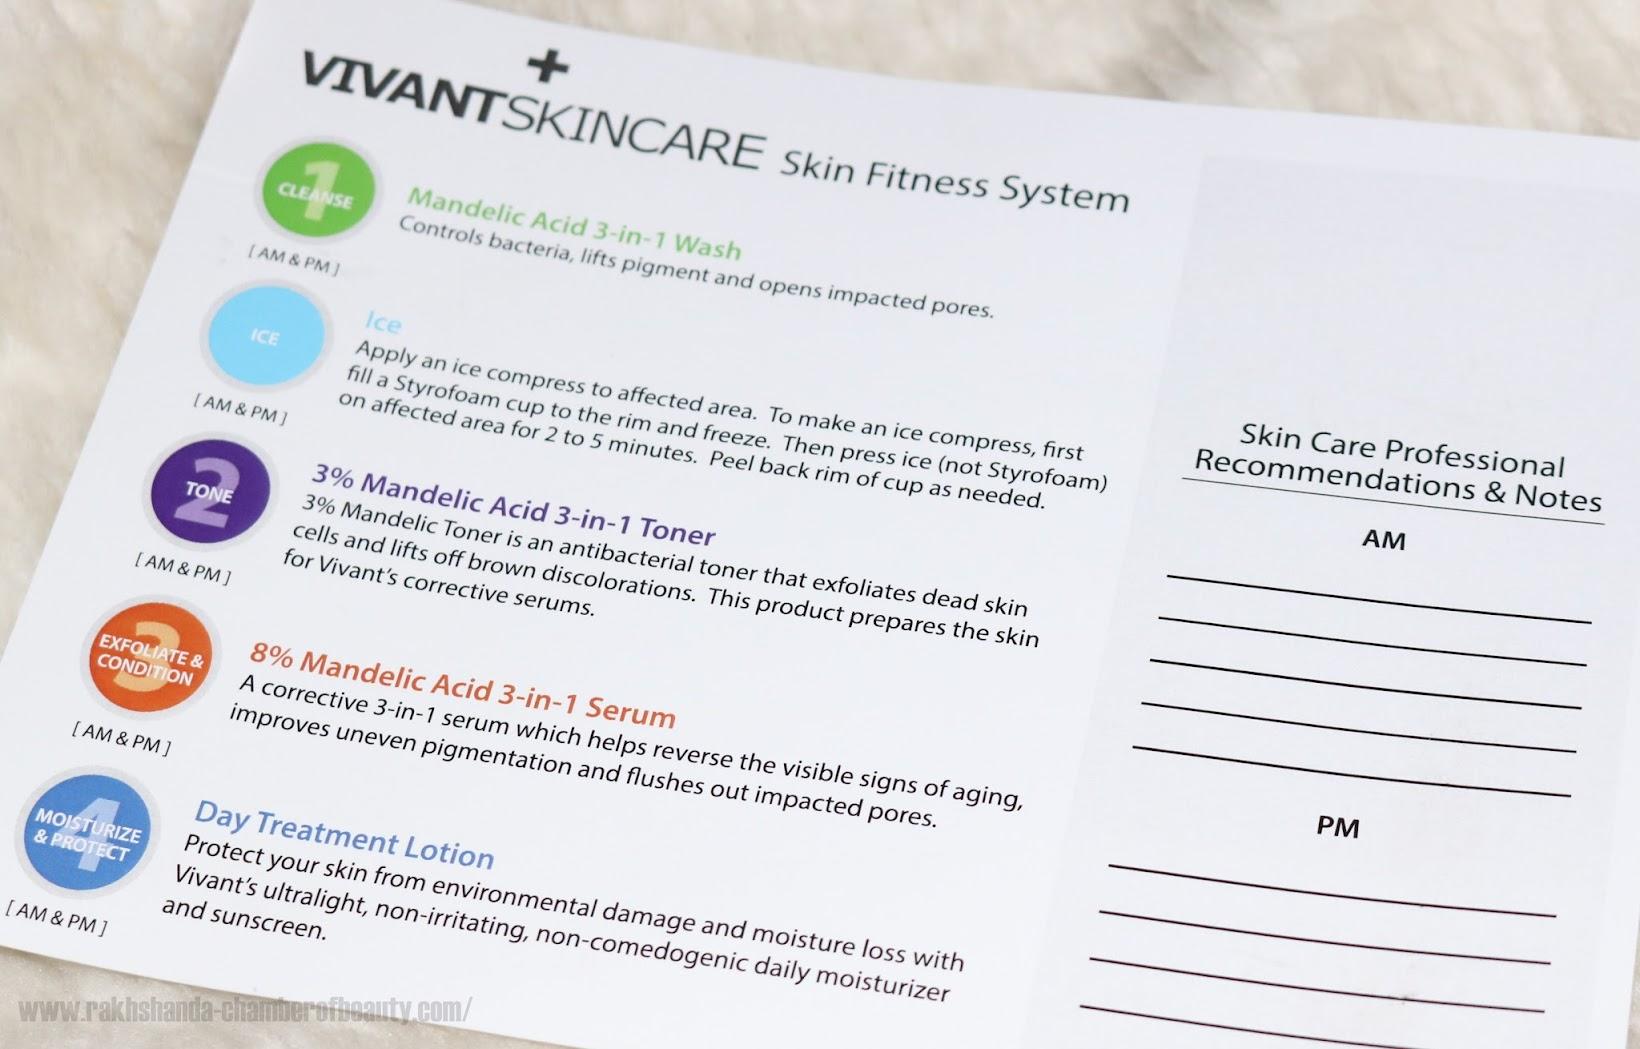 Vivant Skincare Skin Fitness System review